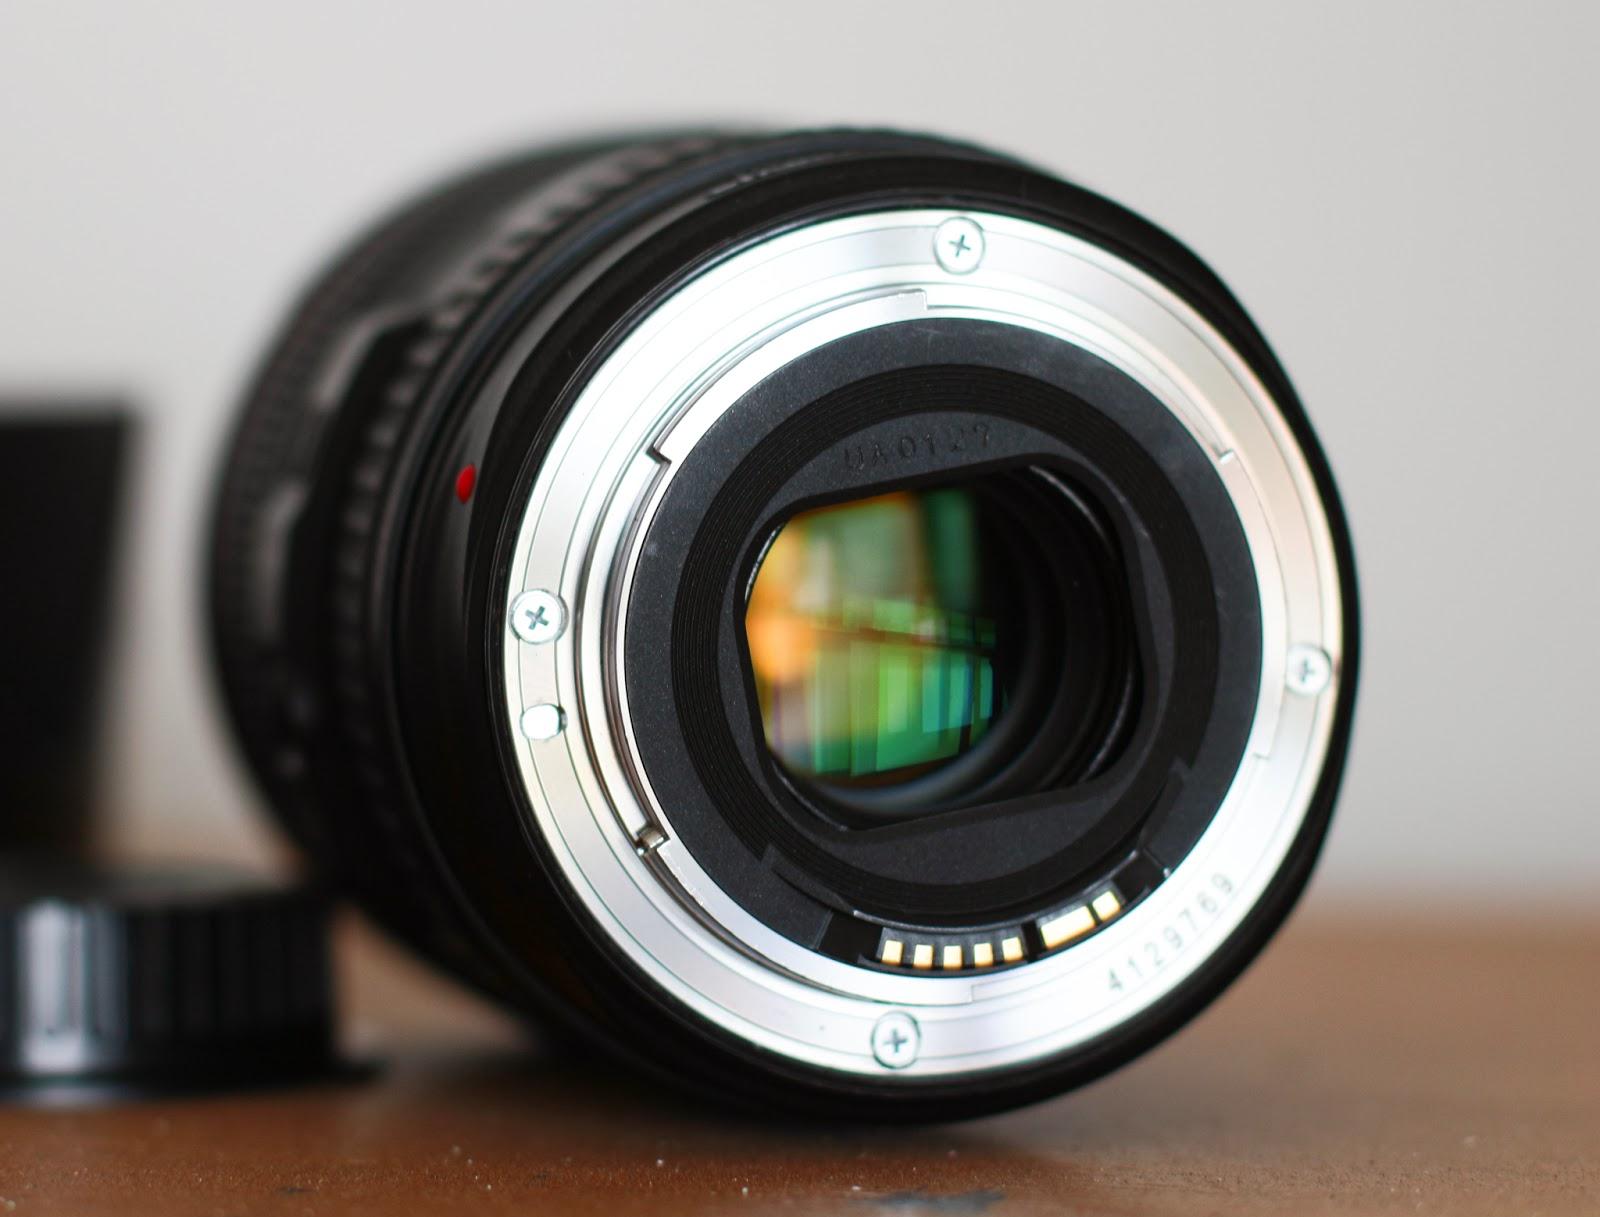 誇扯世界。: 【攝影】 Canon 24-105mm F4L IS USM 開箱 (EOS M + 1D2N)